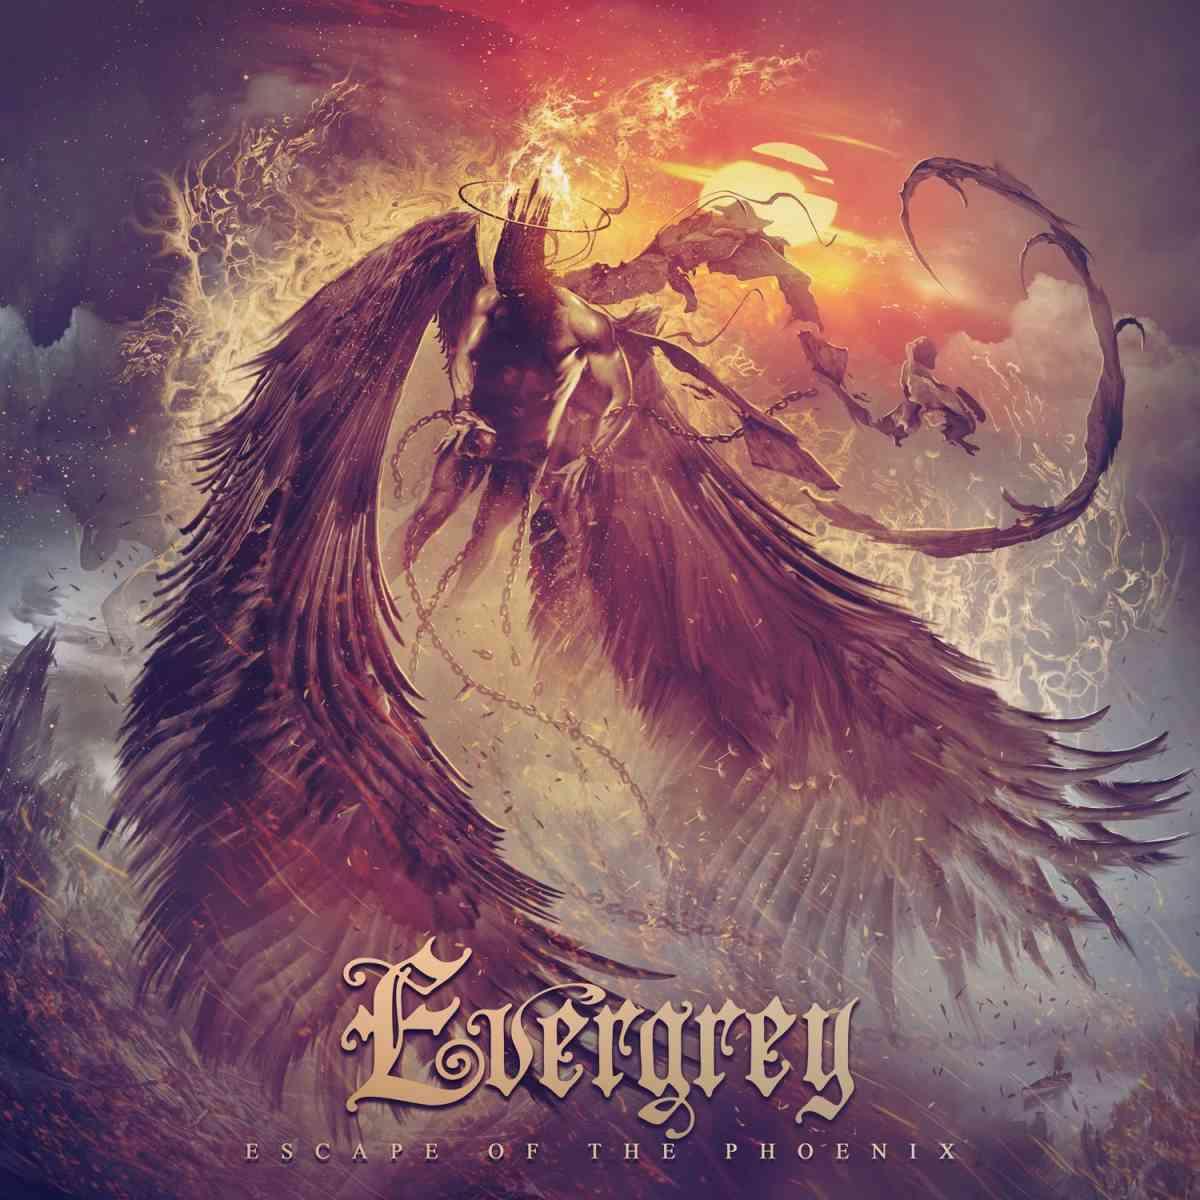 evergrey - escape of the phoenix - album cover